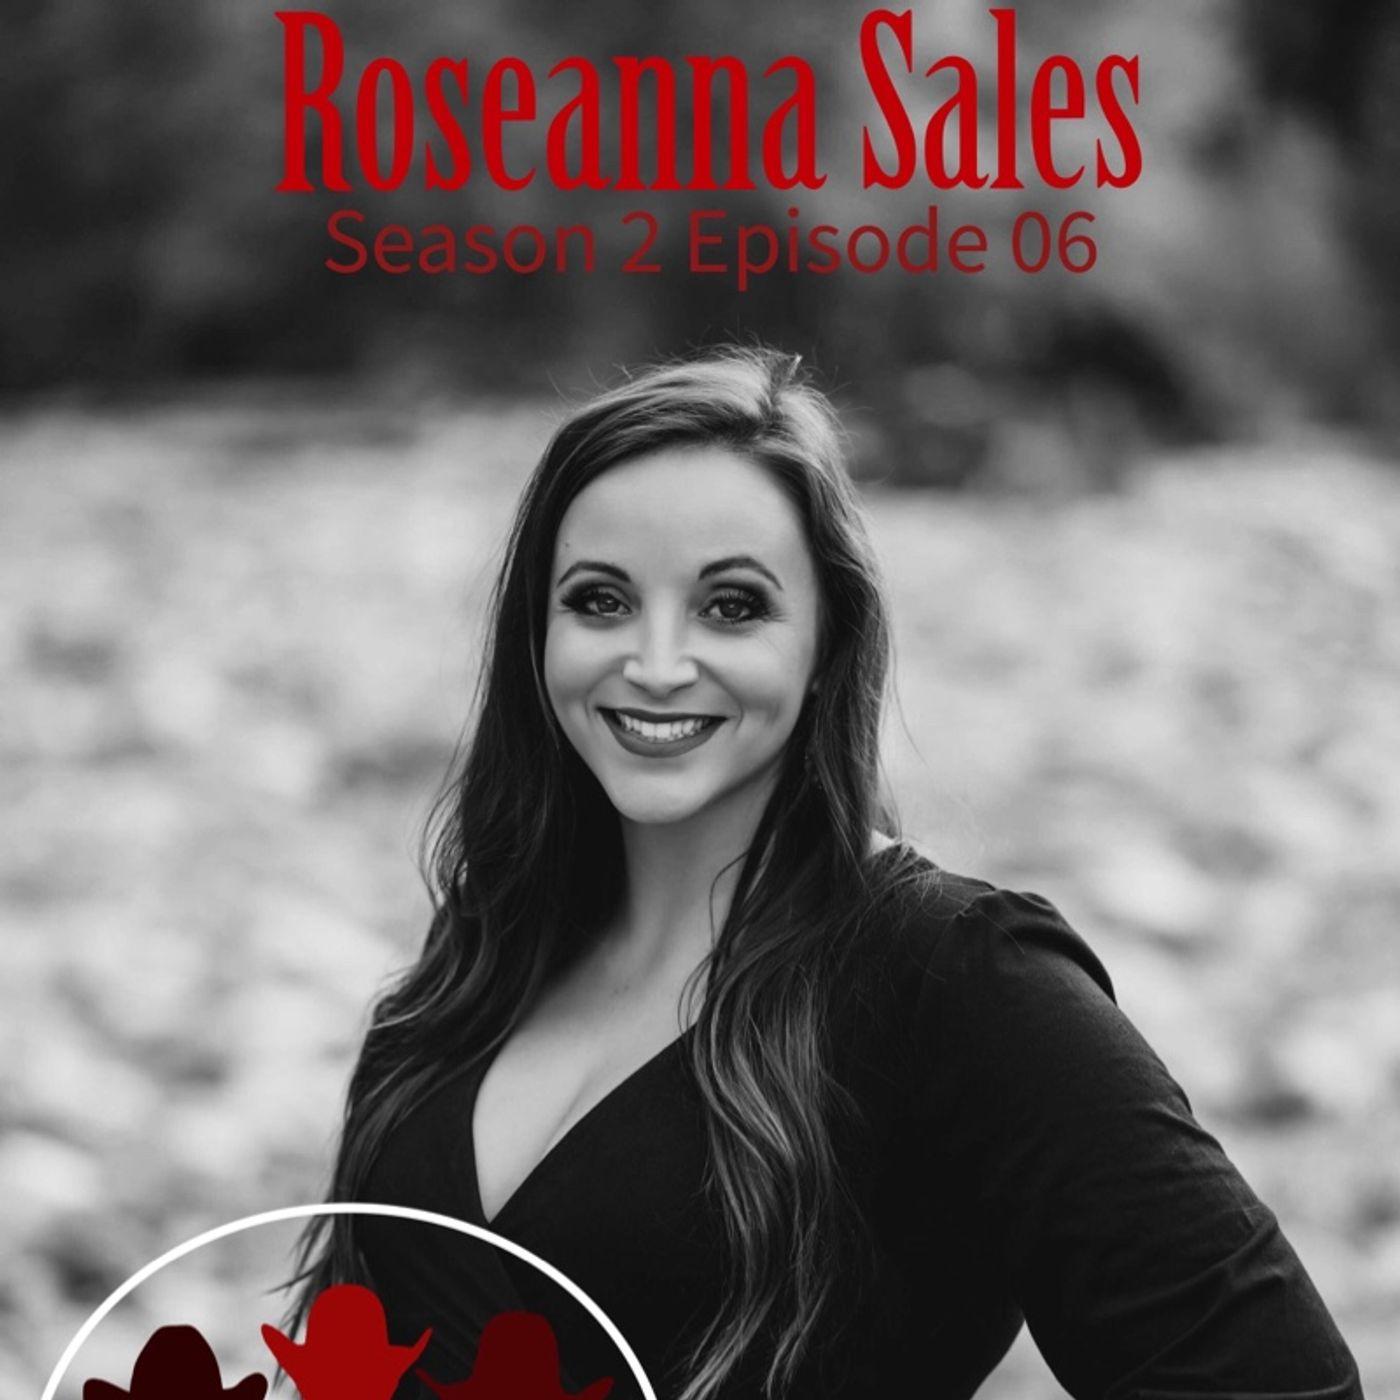 Season 2 Episode 06 - Through the Lens with Roseanna Sales